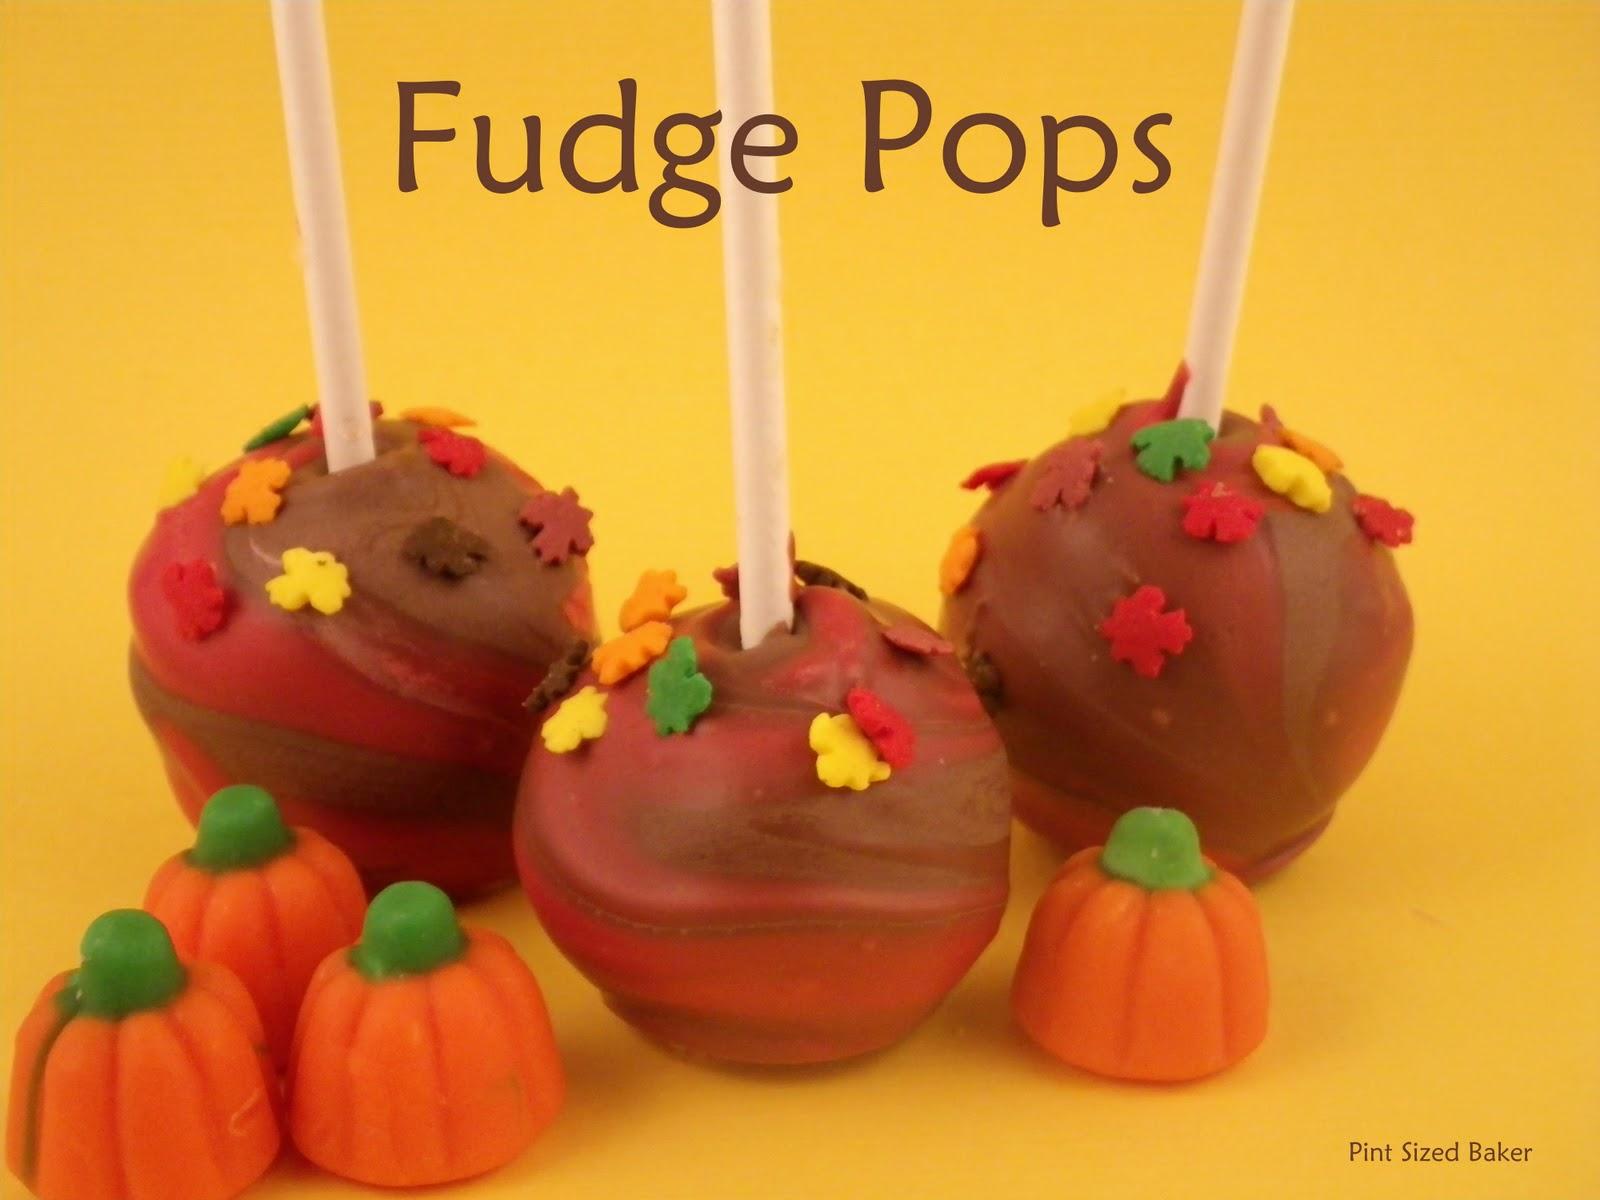 Pint Sized Baker: Fudge Part II